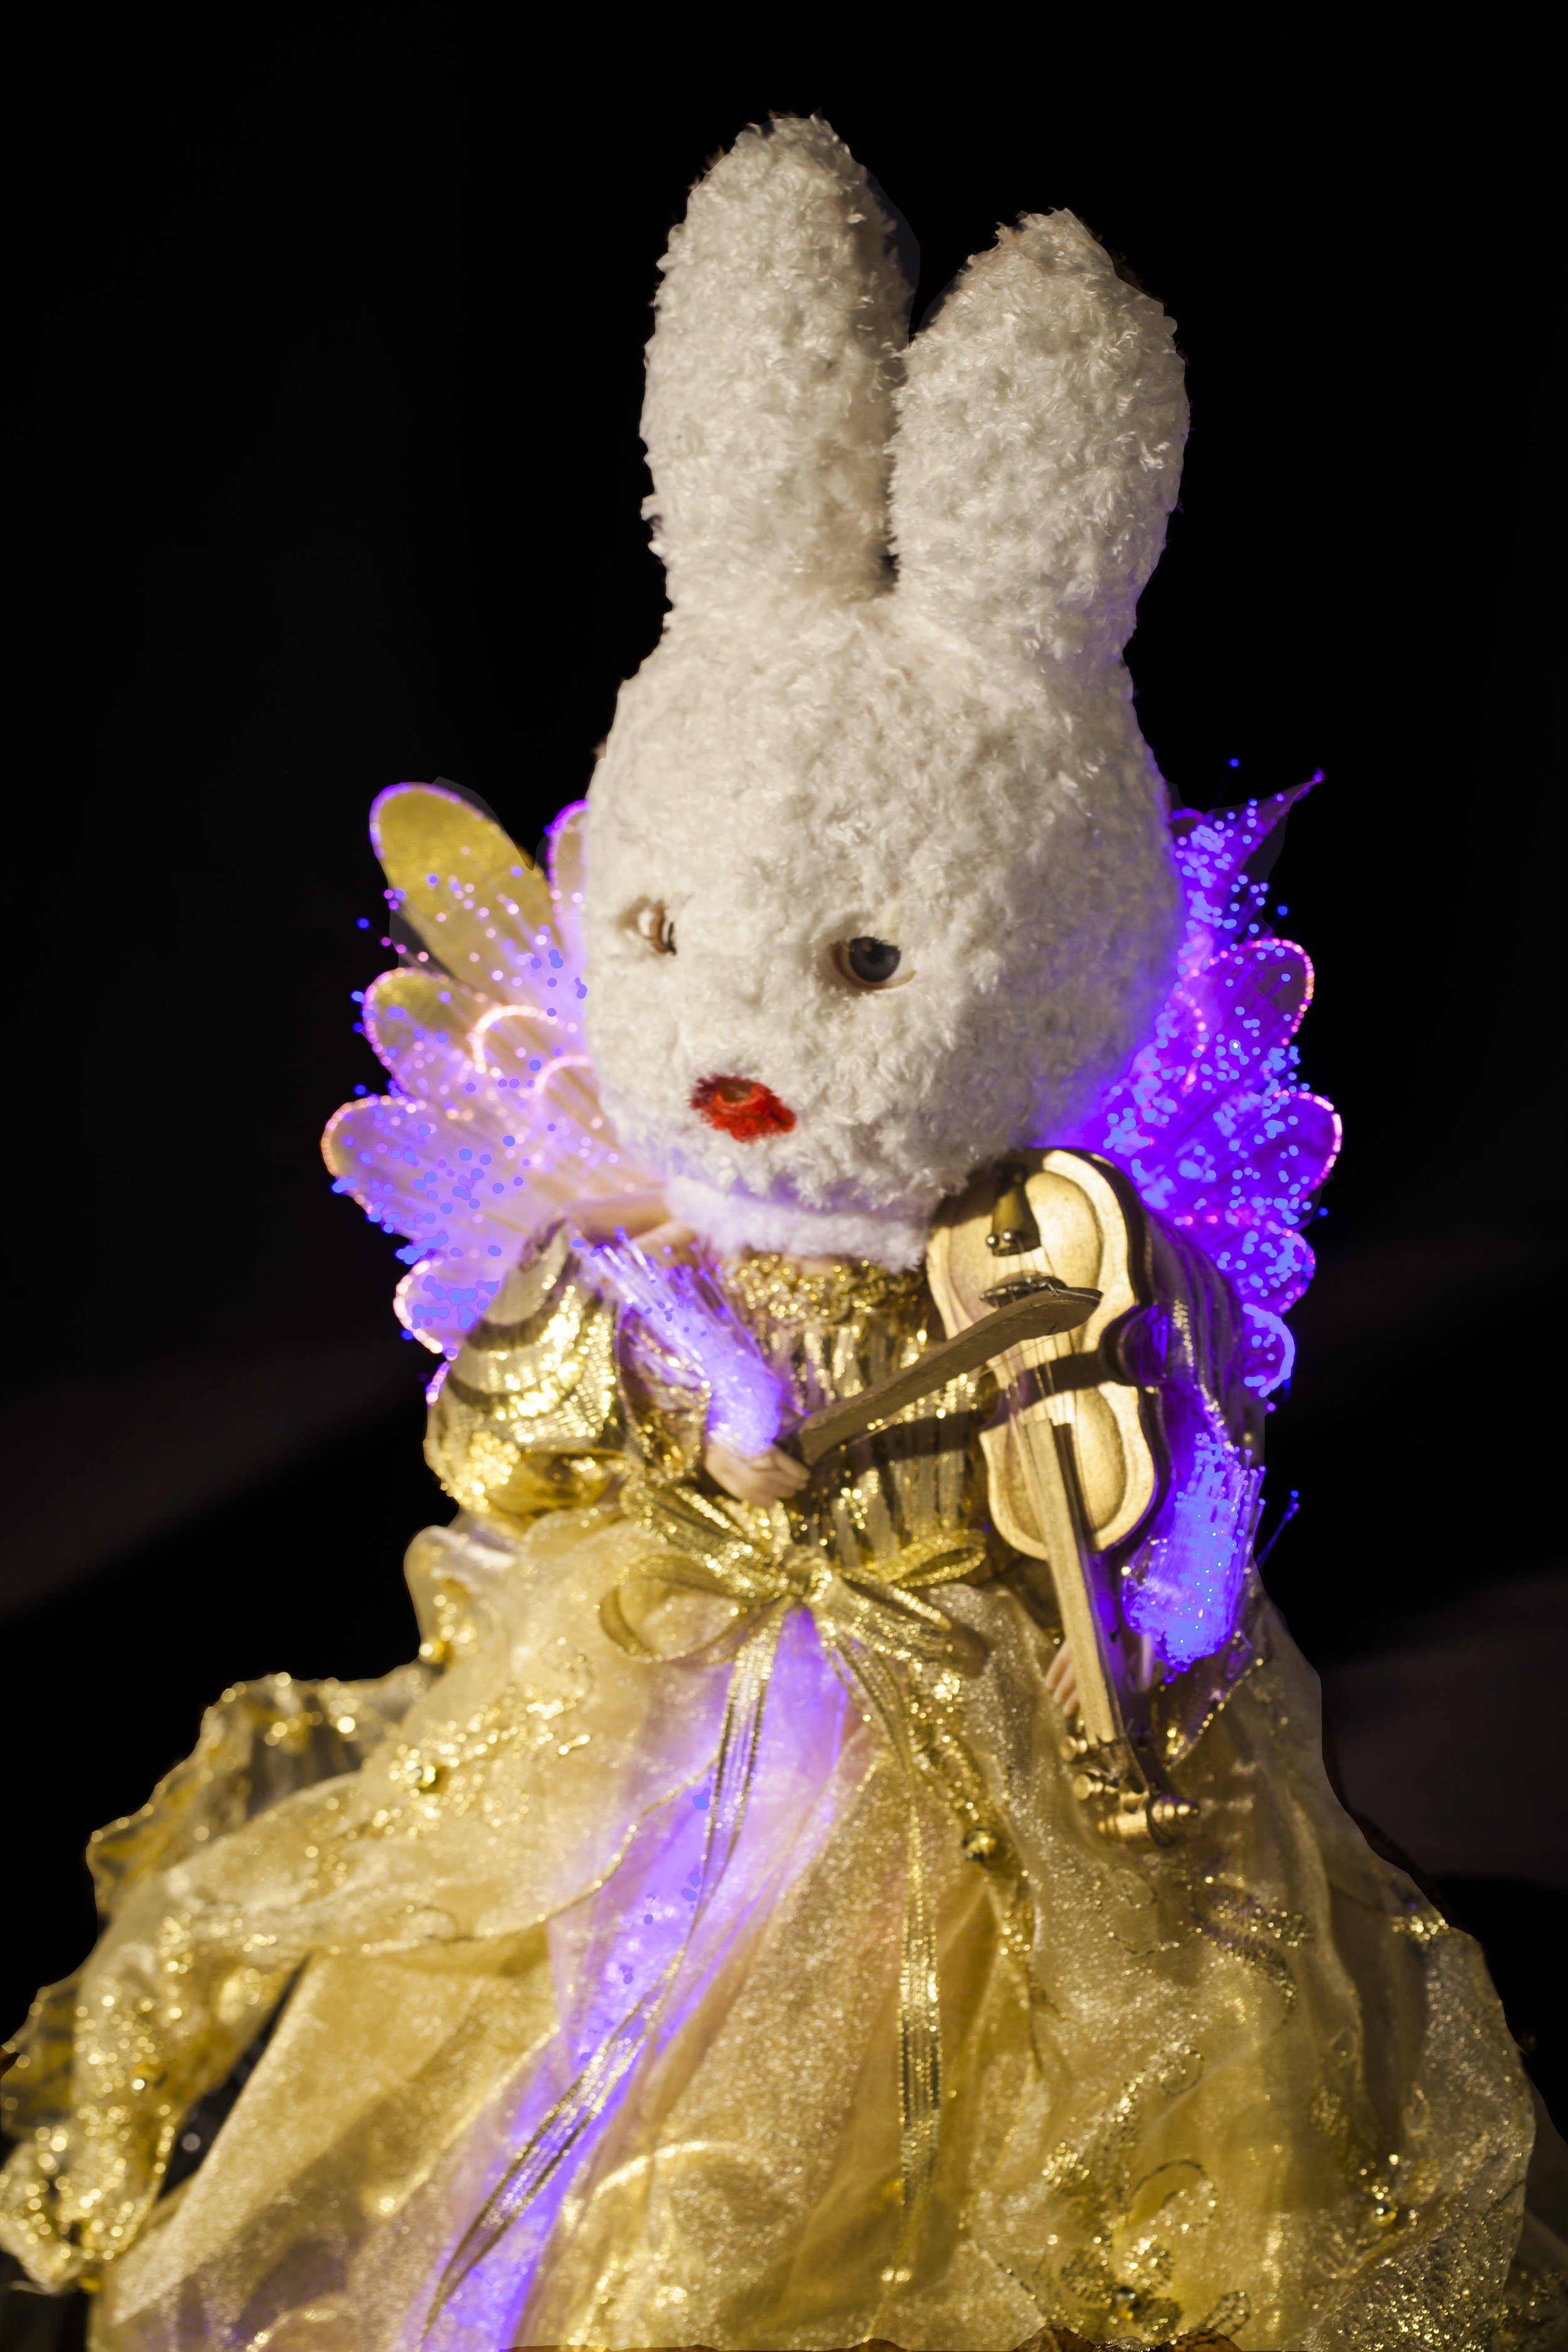 Herstory companion bunny